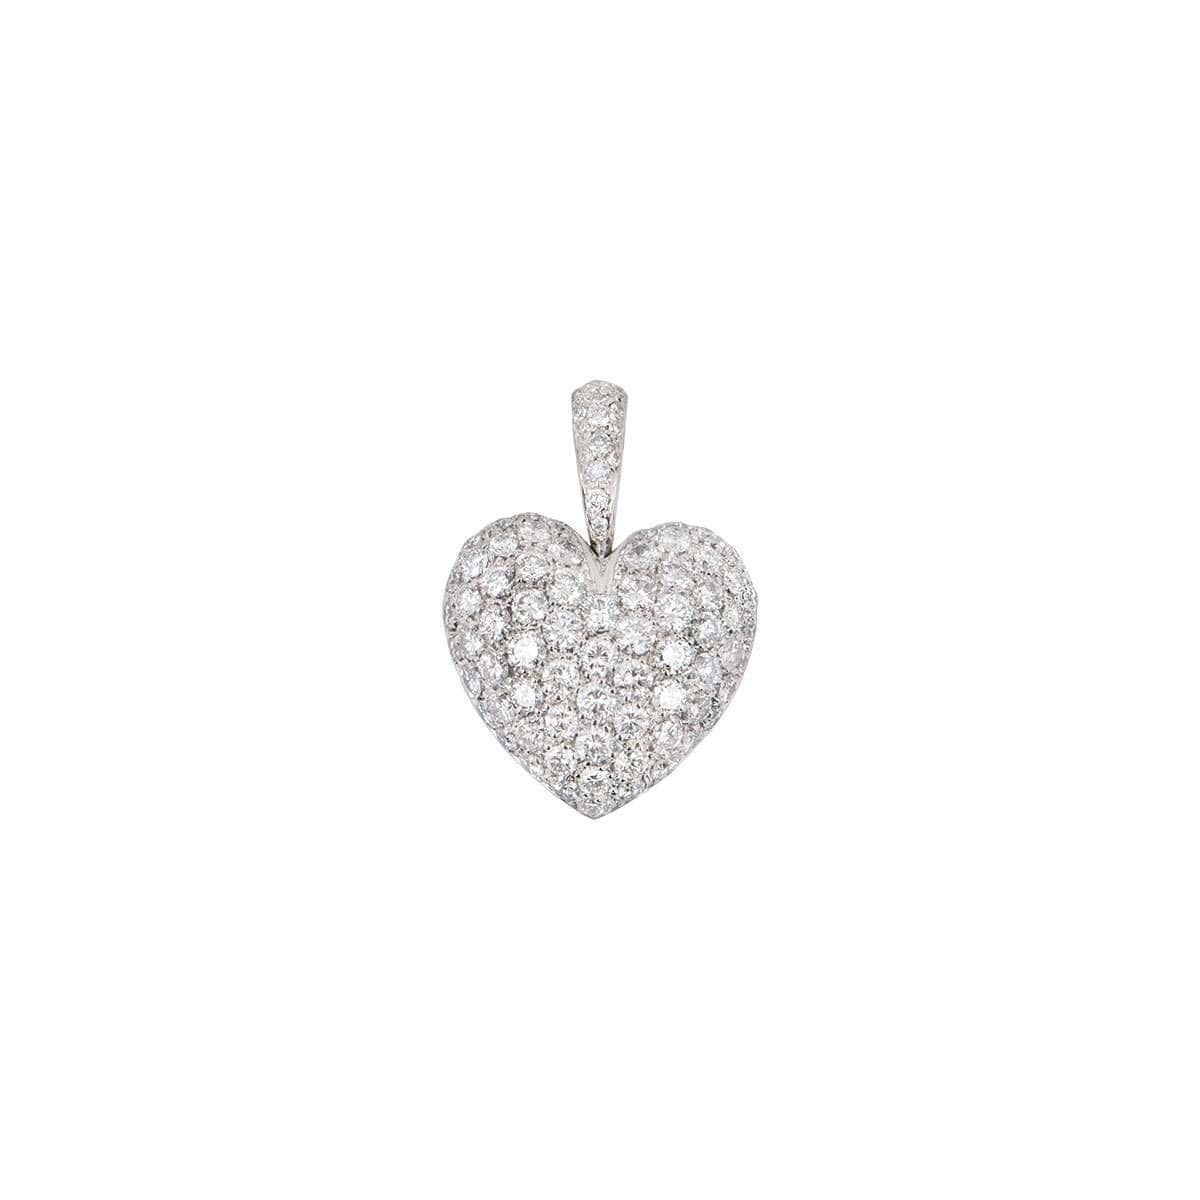 White Gold Diamond Heart Pendant